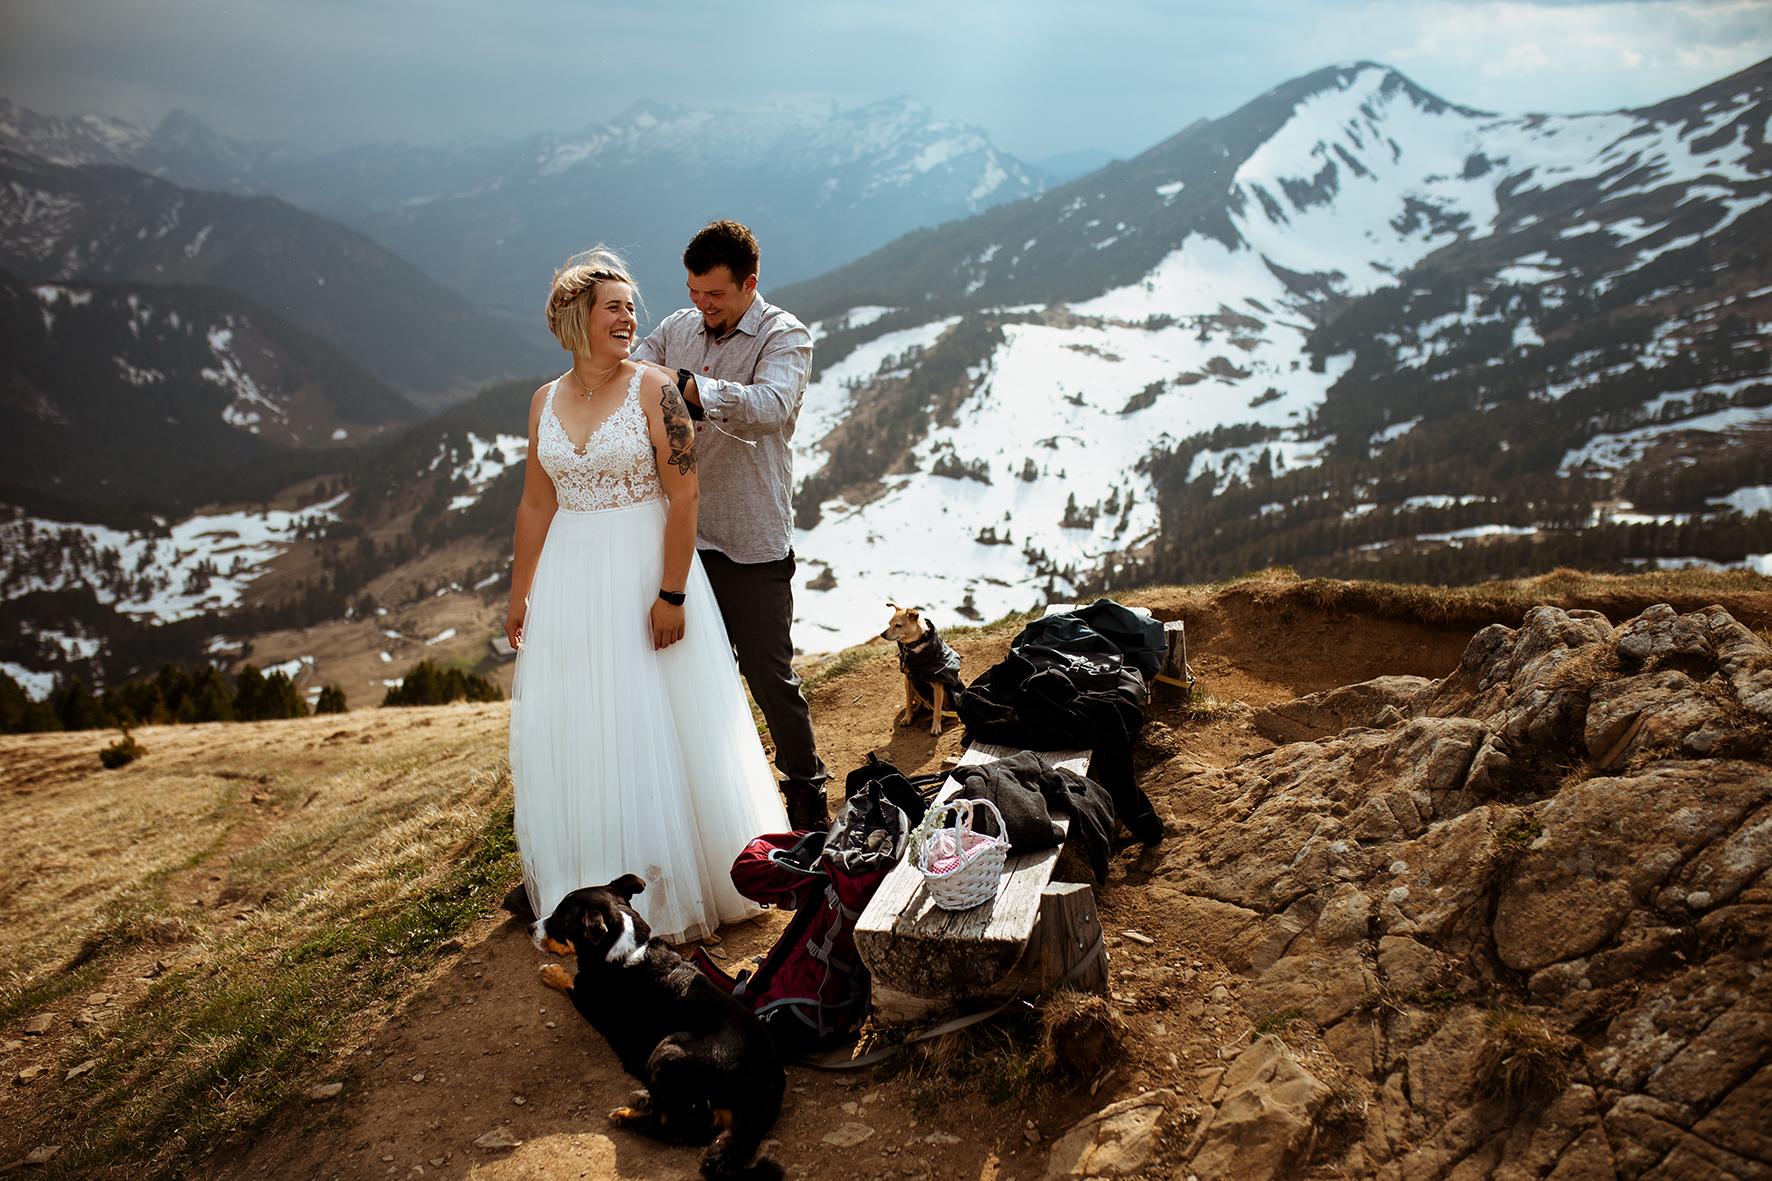 Getting_Ready_Hochzeit_Berge_03